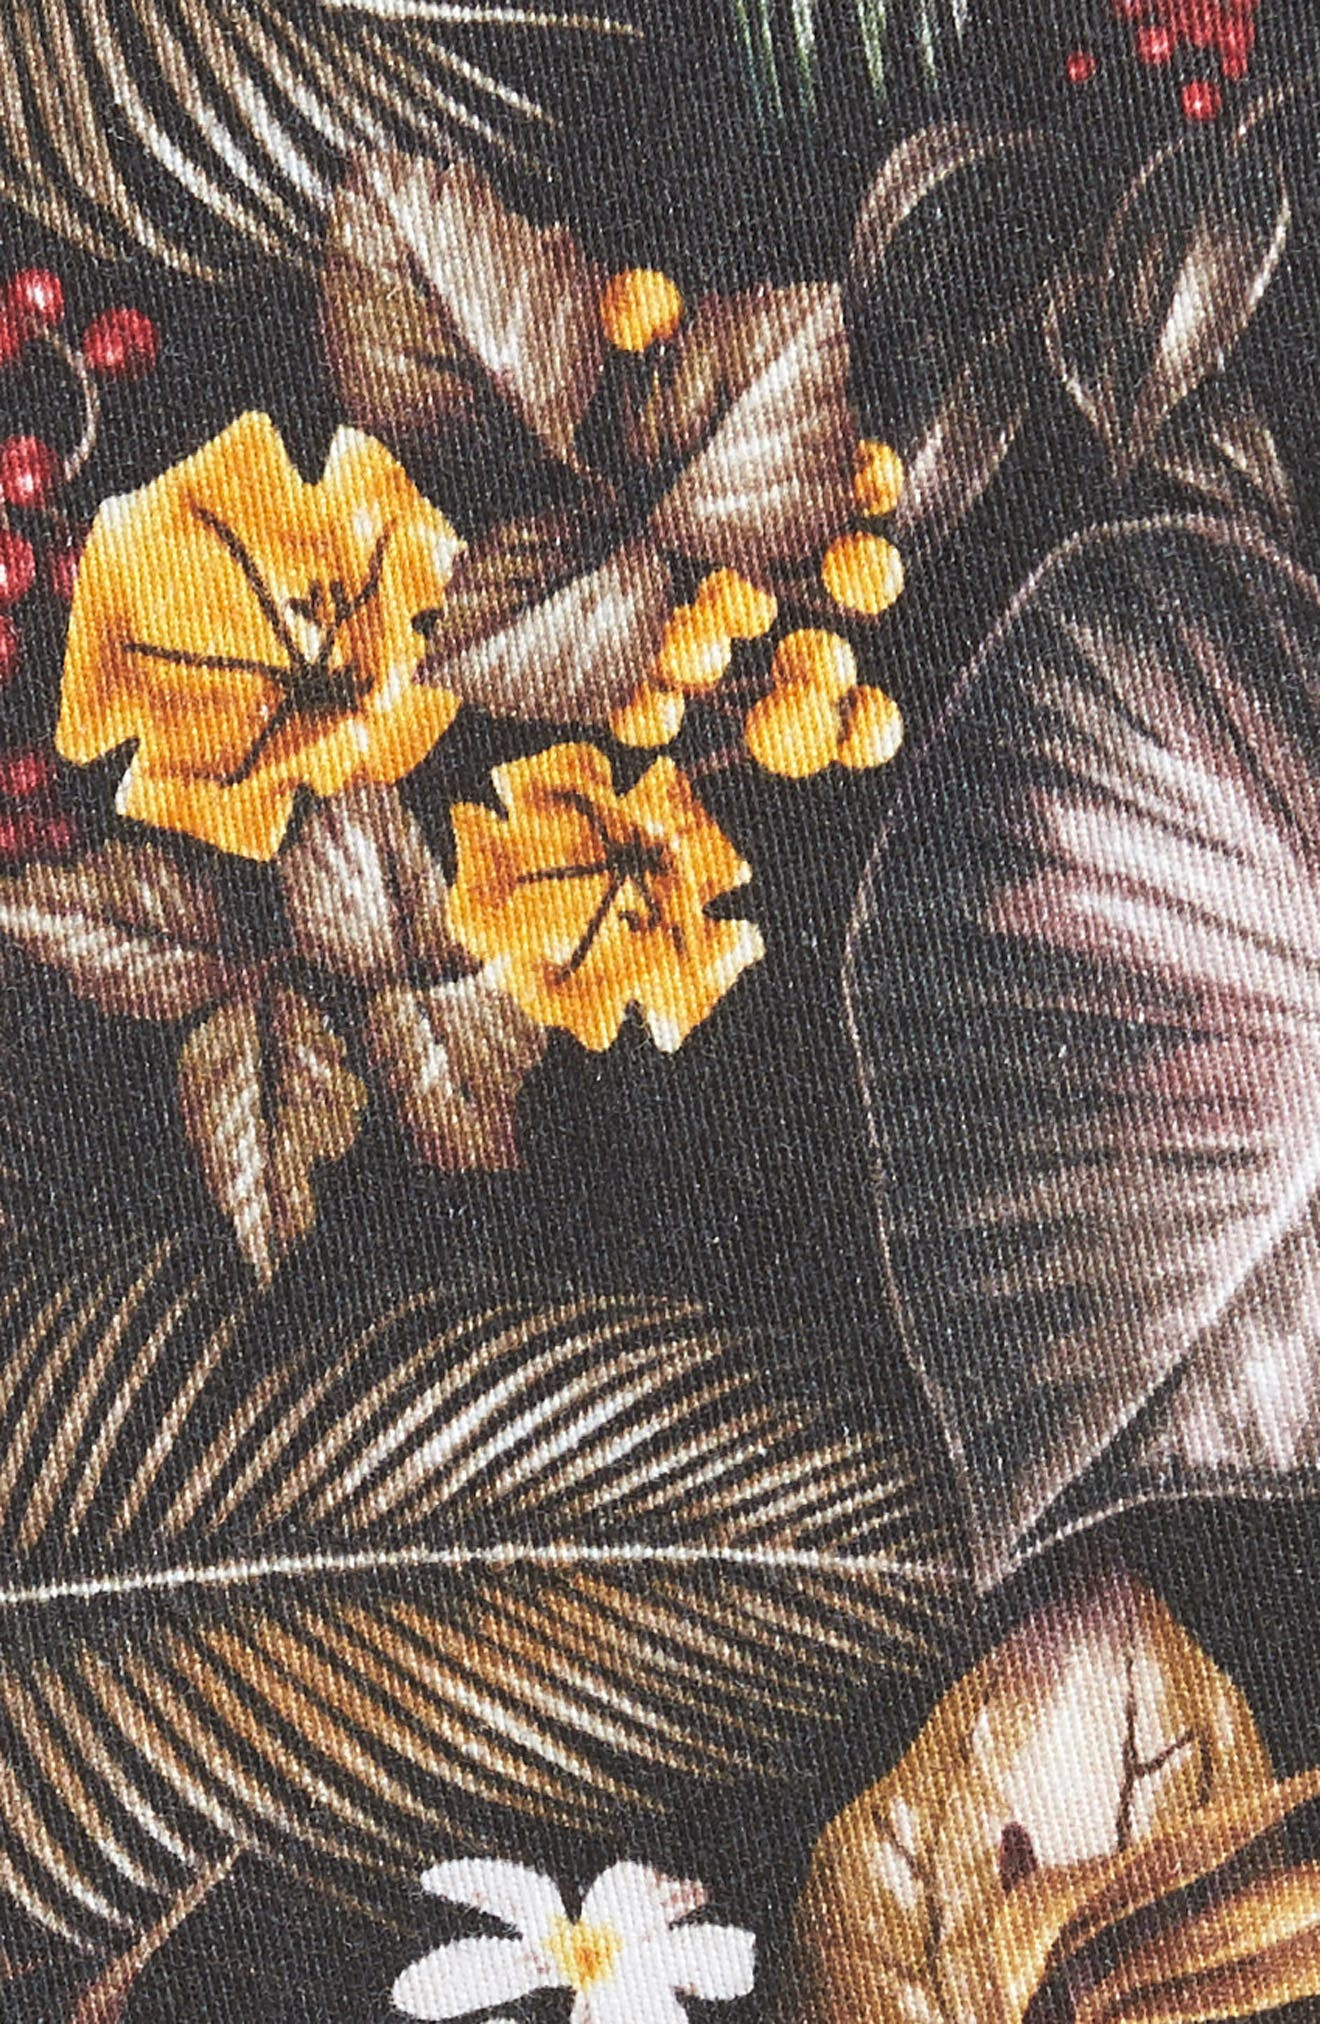 Maracas Woven Shorts,                             Alternate thumbnail 4, color,                             Multi